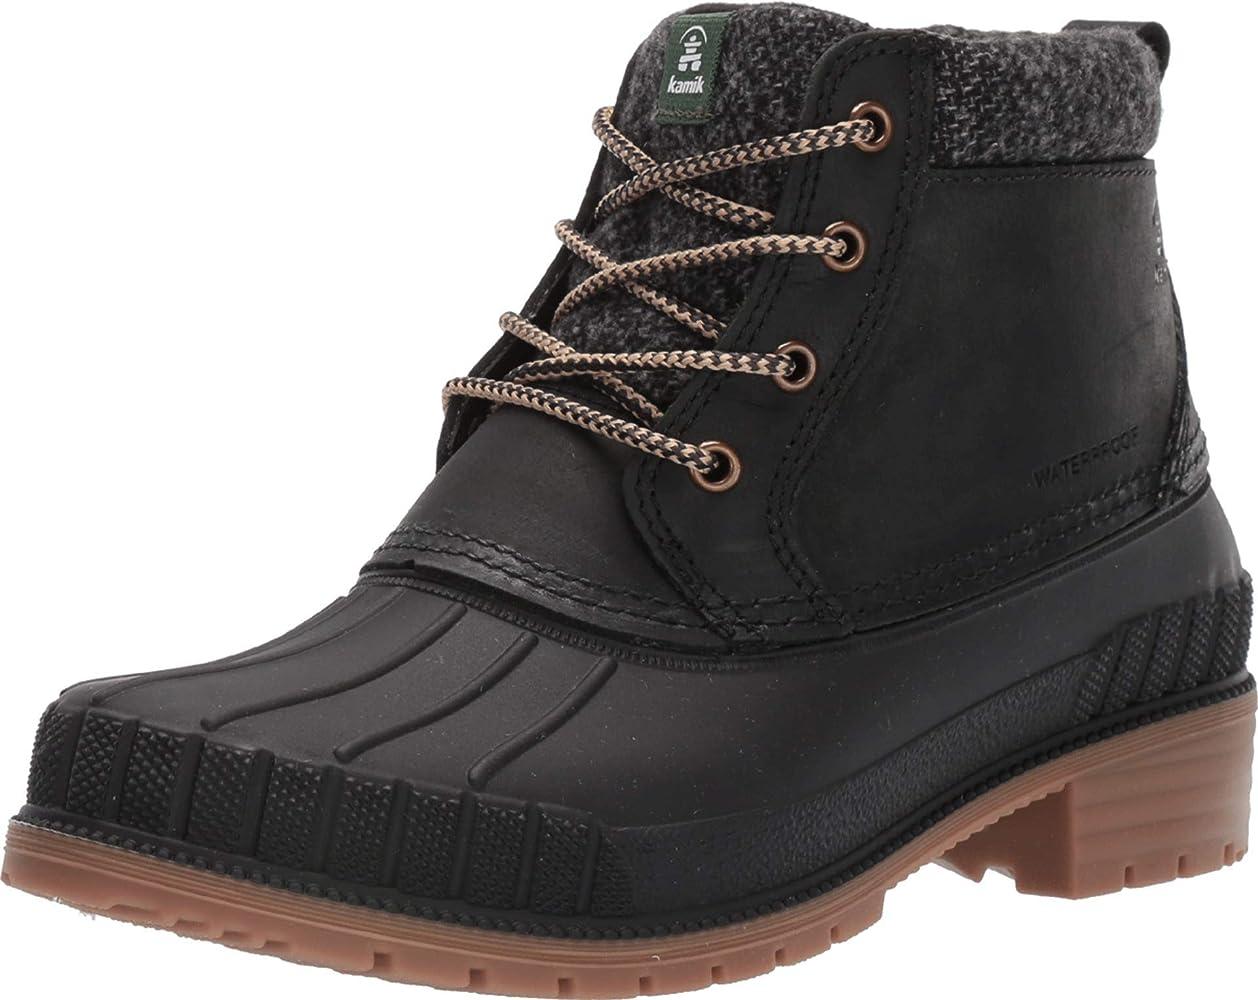 Kamik Women's Evelyn4 Low Cut Boots